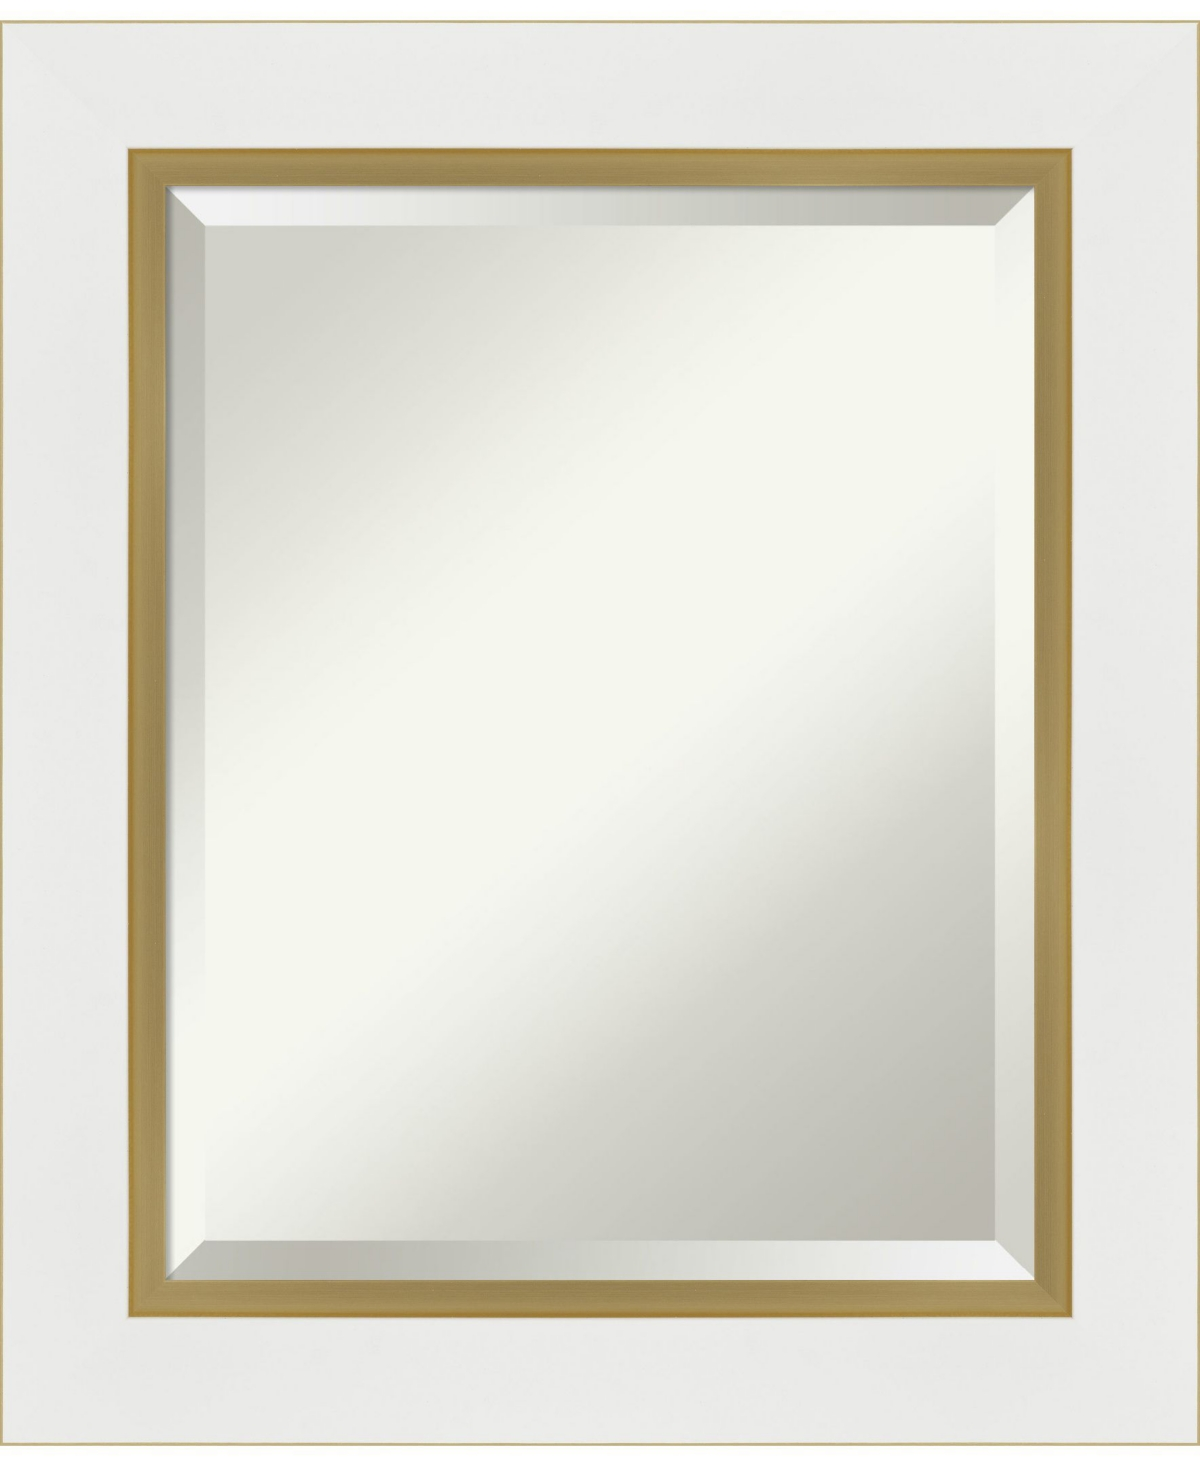 Amanti Art Eva Gold-tone Framed Bathroom Vanity Wall Mirror, 21.25